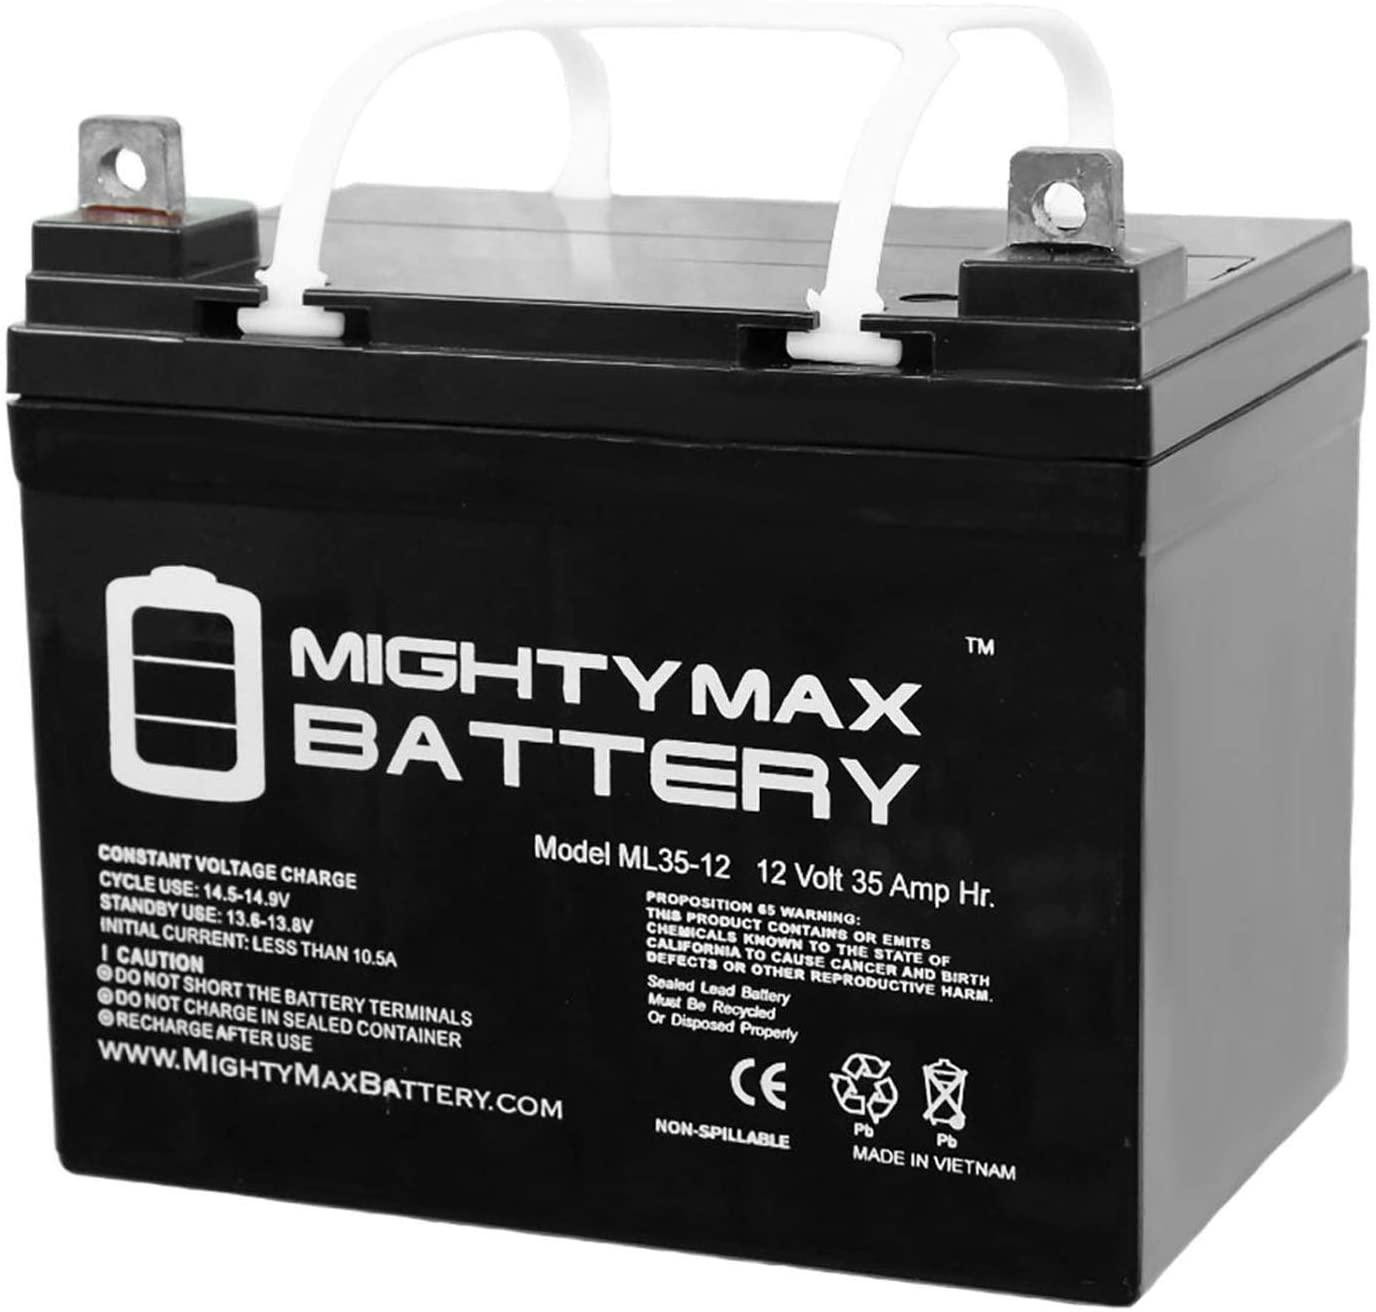 Mighty Max Battery ML35-12 - 12V 35AH Emergency Exit Lighting SLA Battery Brand Product